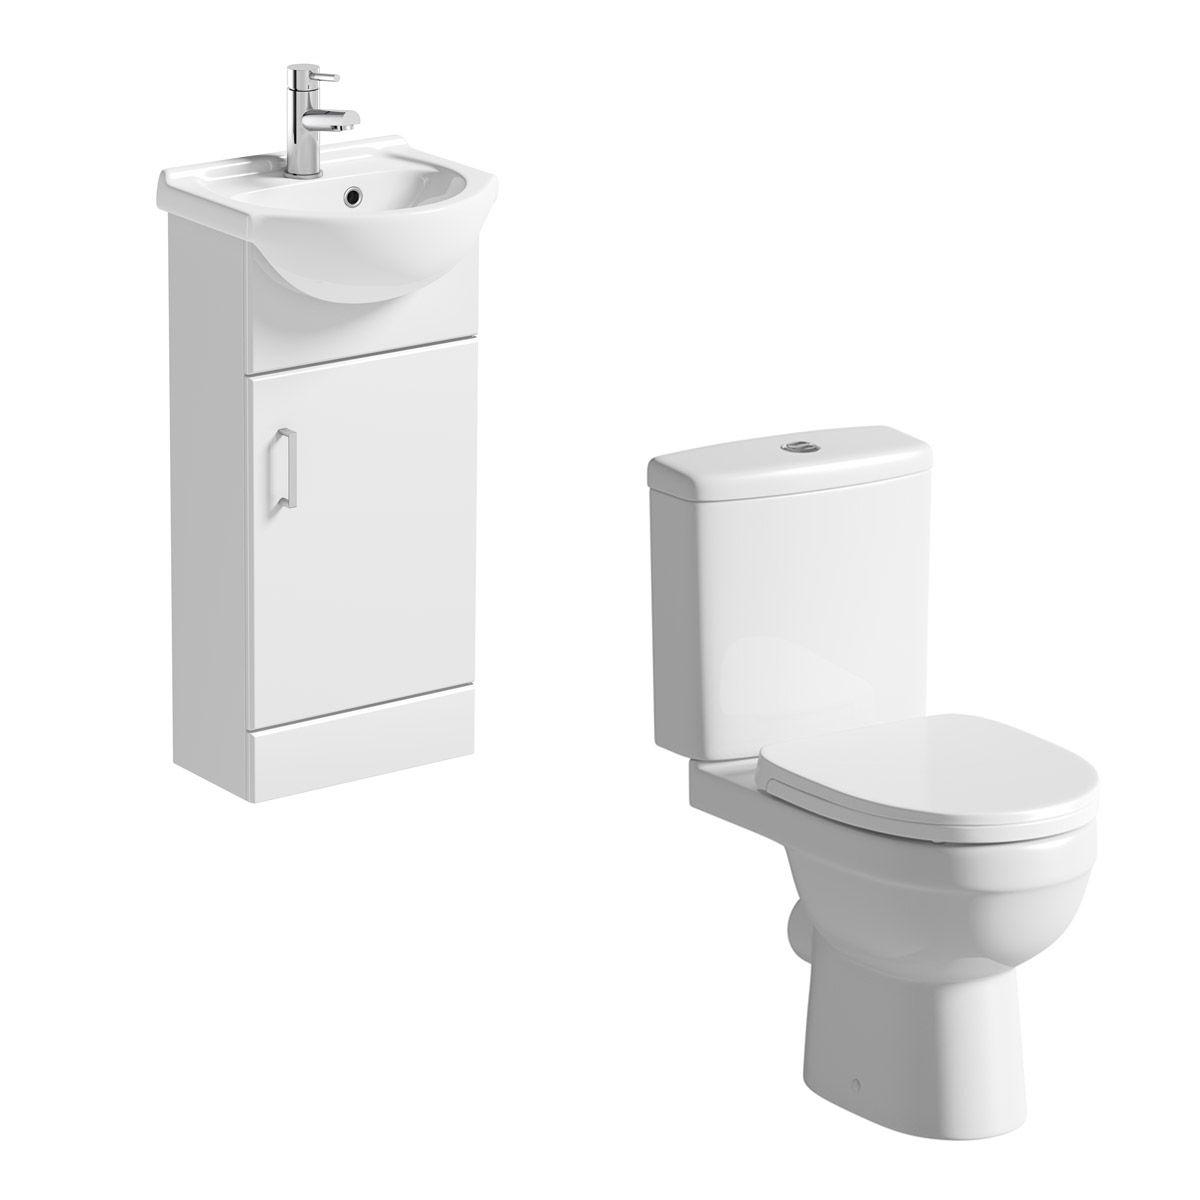 550mm Bathroom Vanity Unit Basin Sink Cabinet /& Close Coupled Toilet Pan Cistern